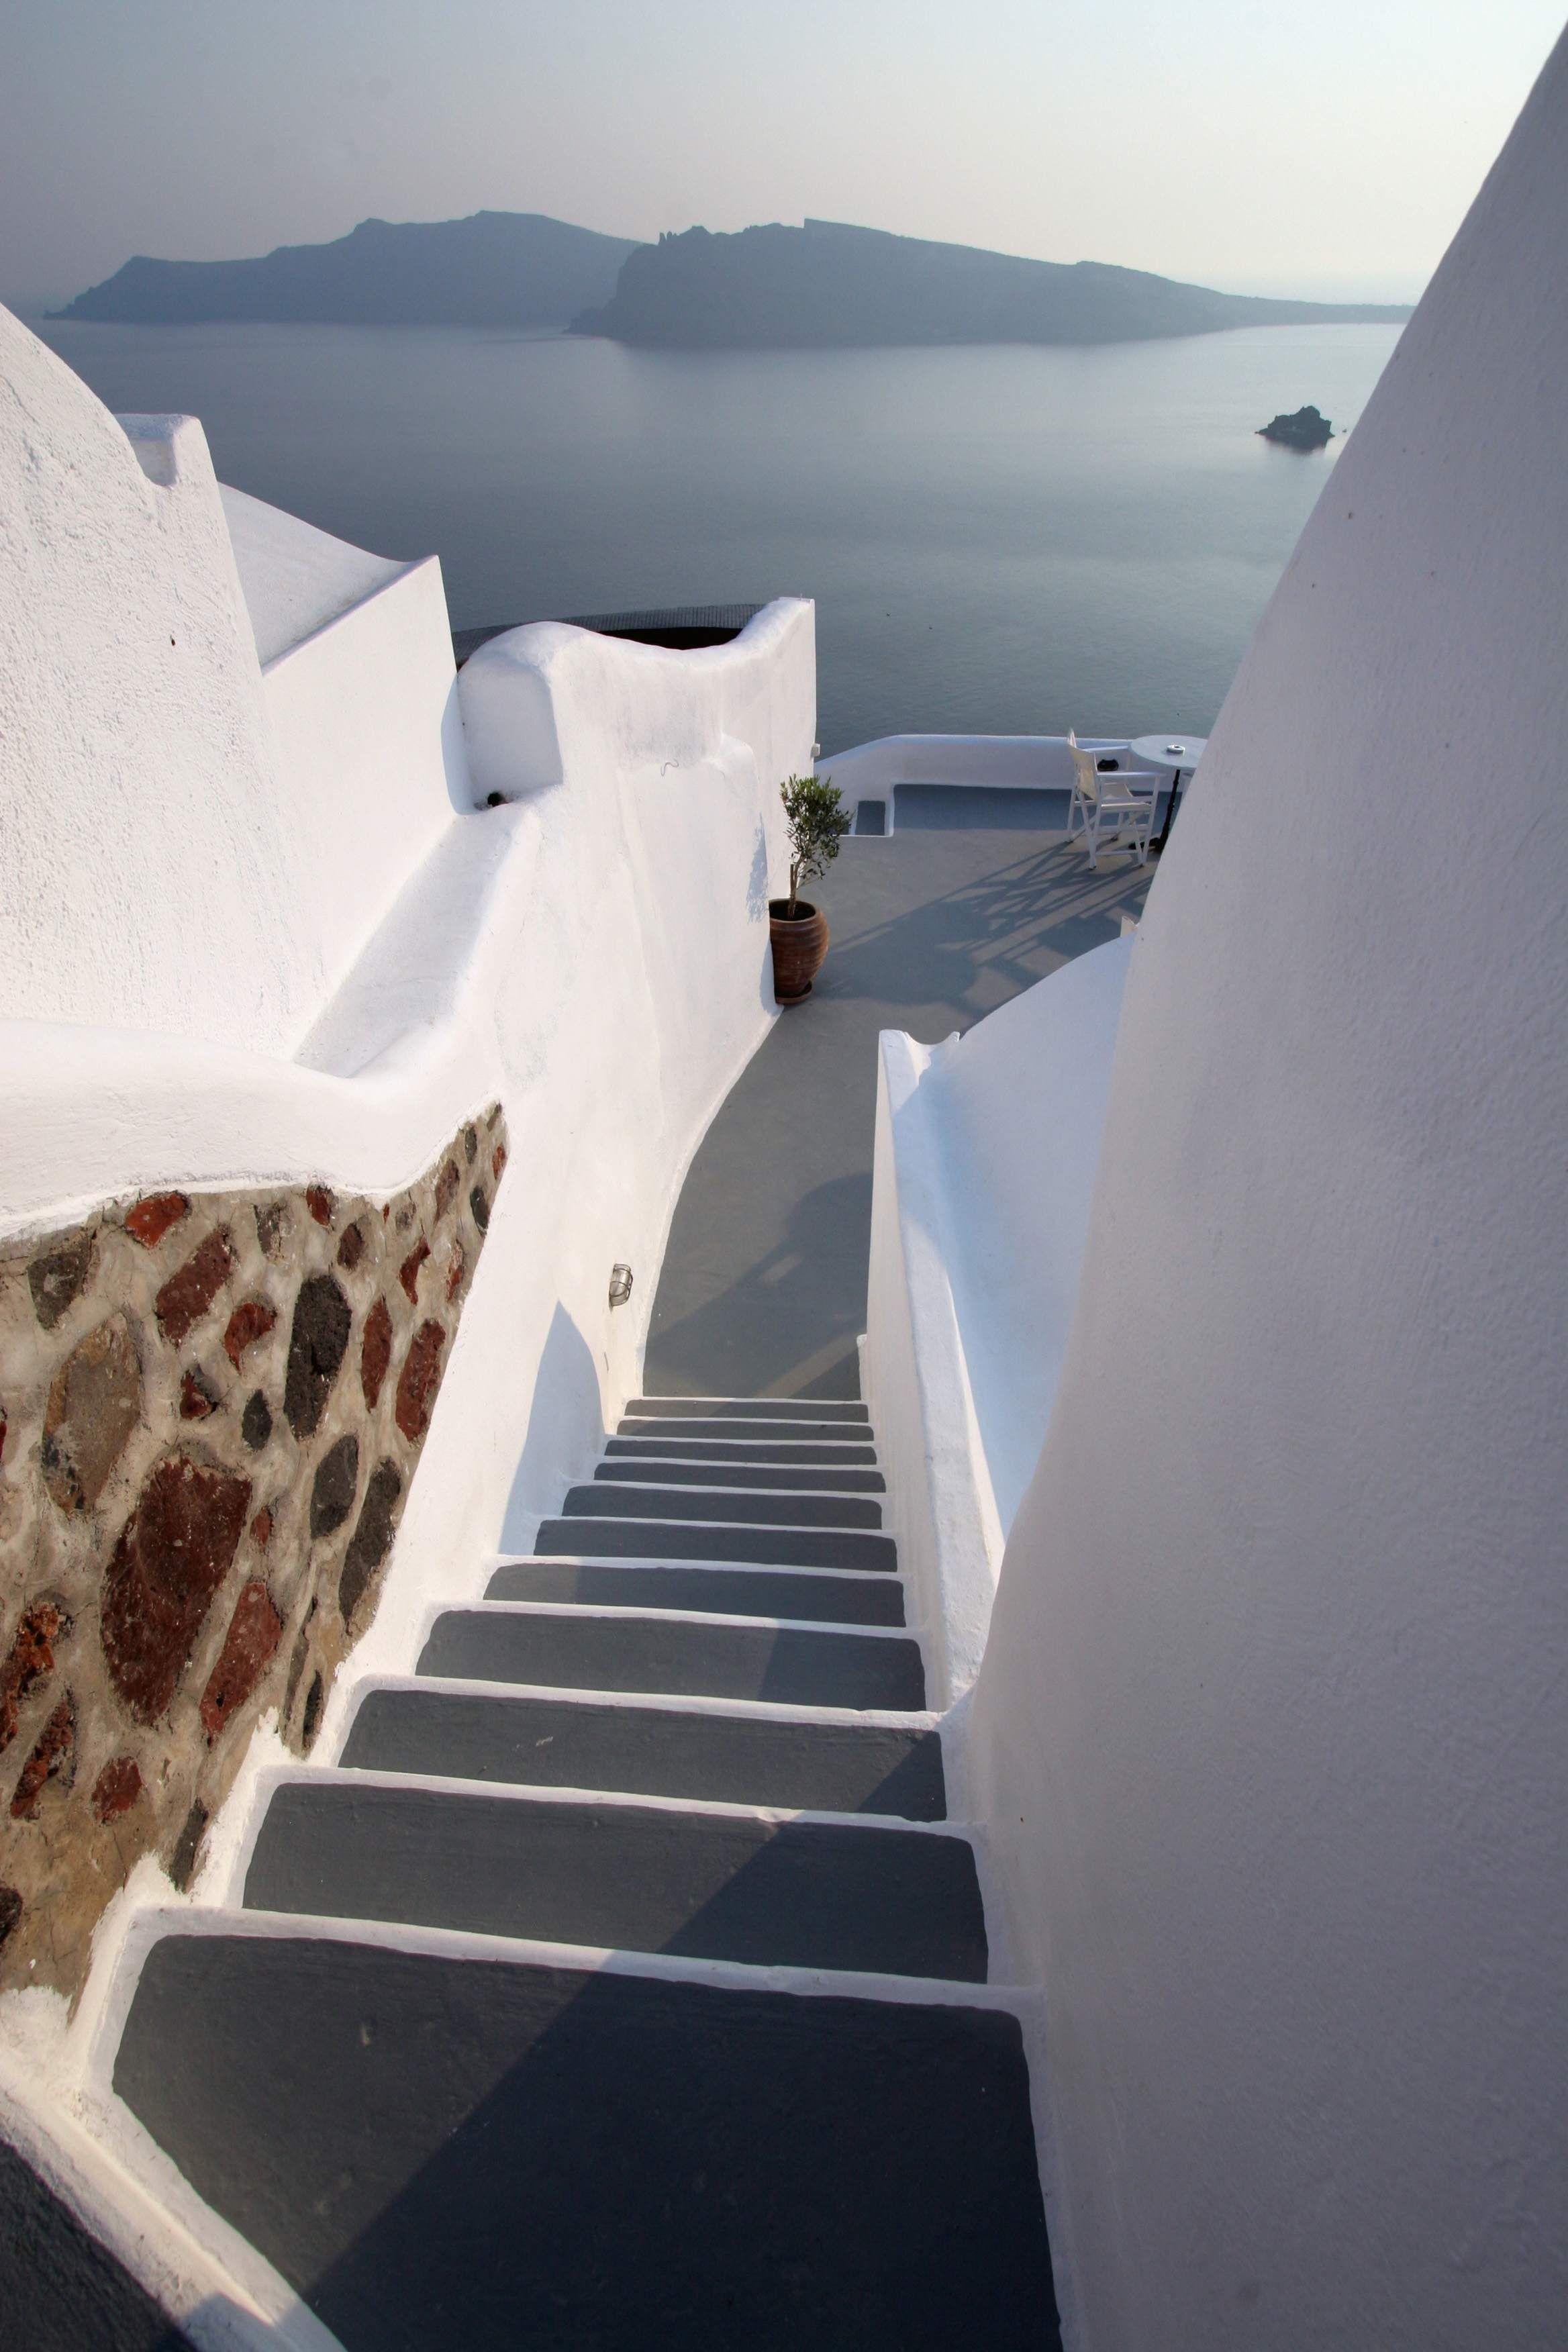 Santorini   http://www.cycladia.com/travel-guides-greece/santorini-guide-tips/